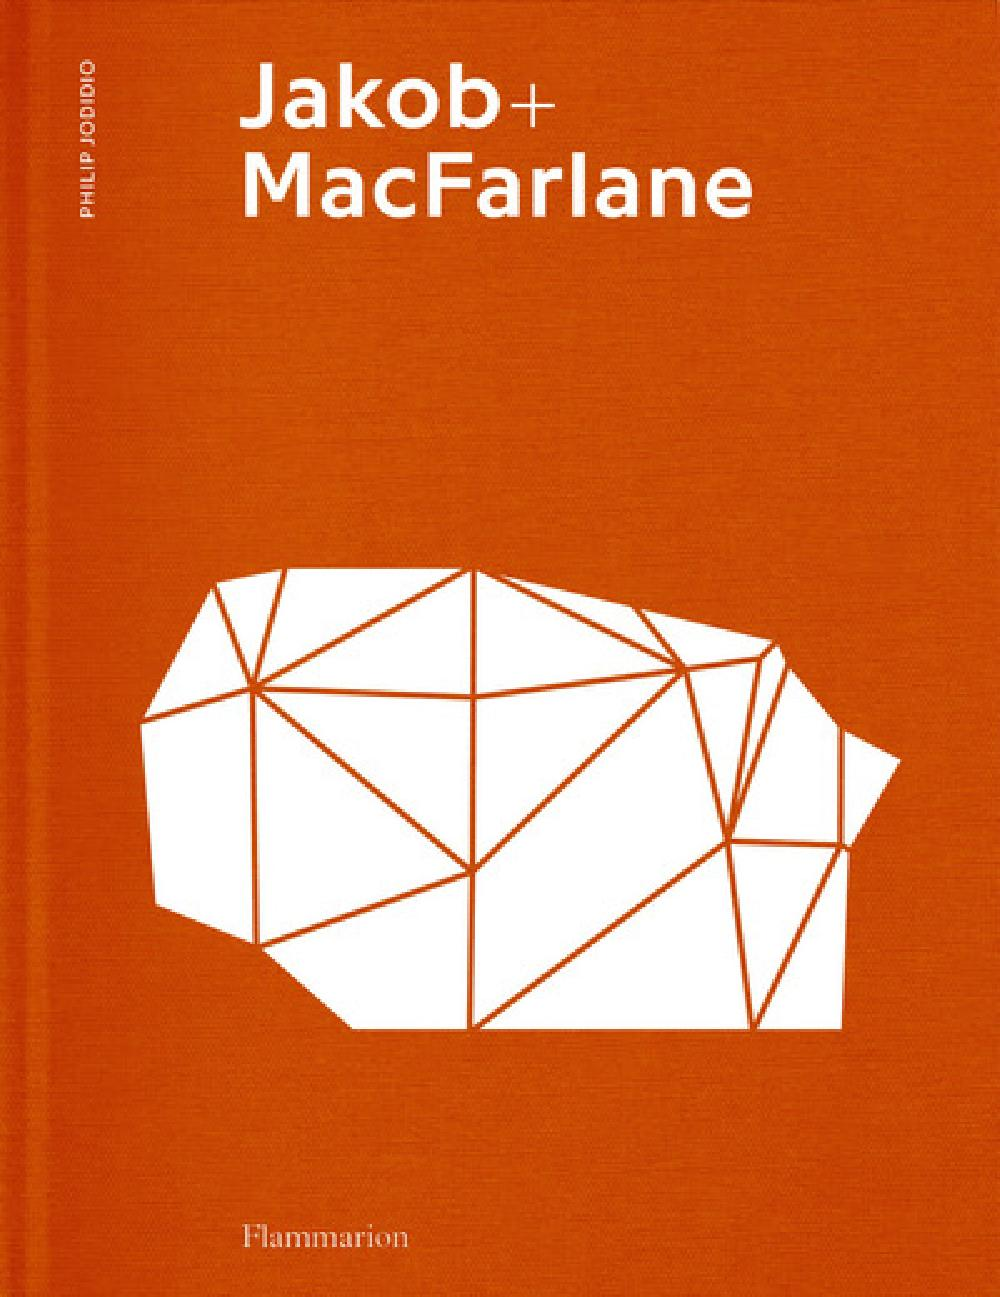 Jakob + MacFarlane - Couverture orange